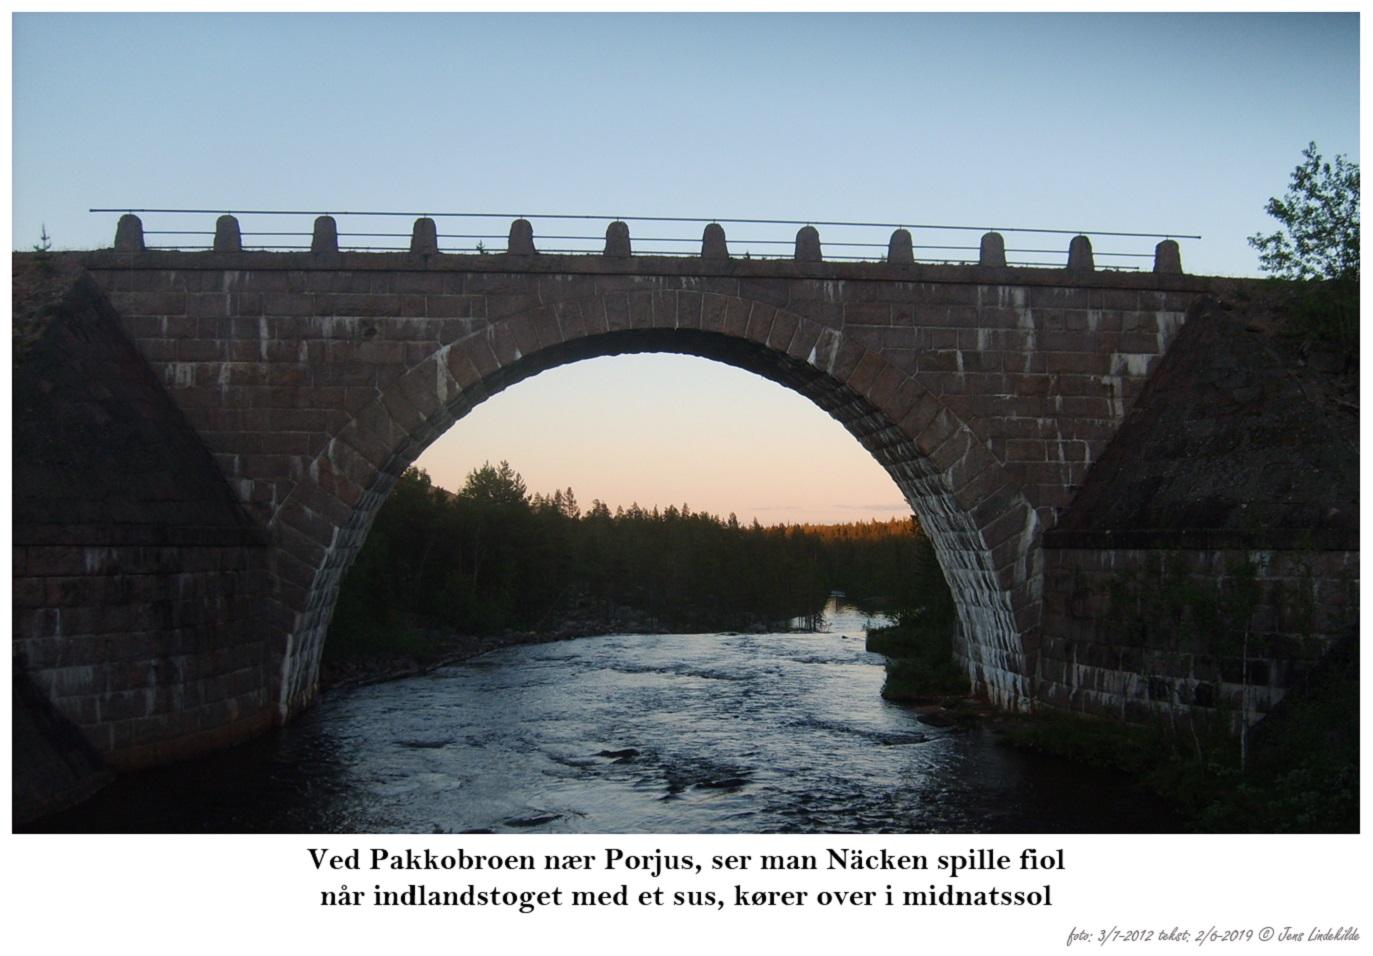 Ved-Pakkobroen-nær-Porjus